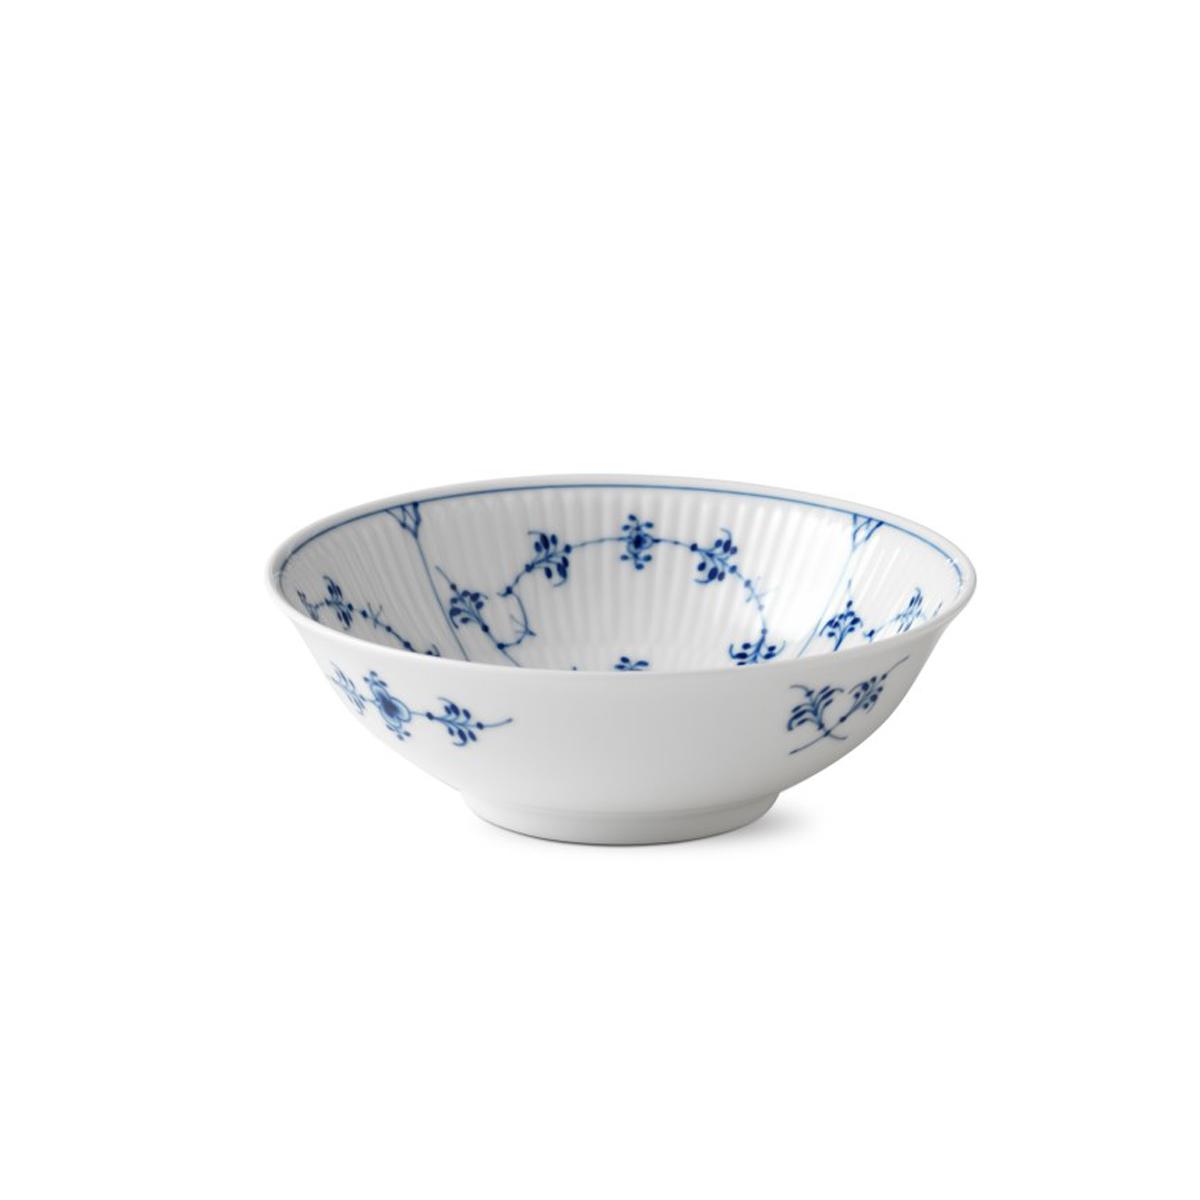 Royal Copenhagen, Blue Fluted Plain Cereal Bowl 11.75oz.